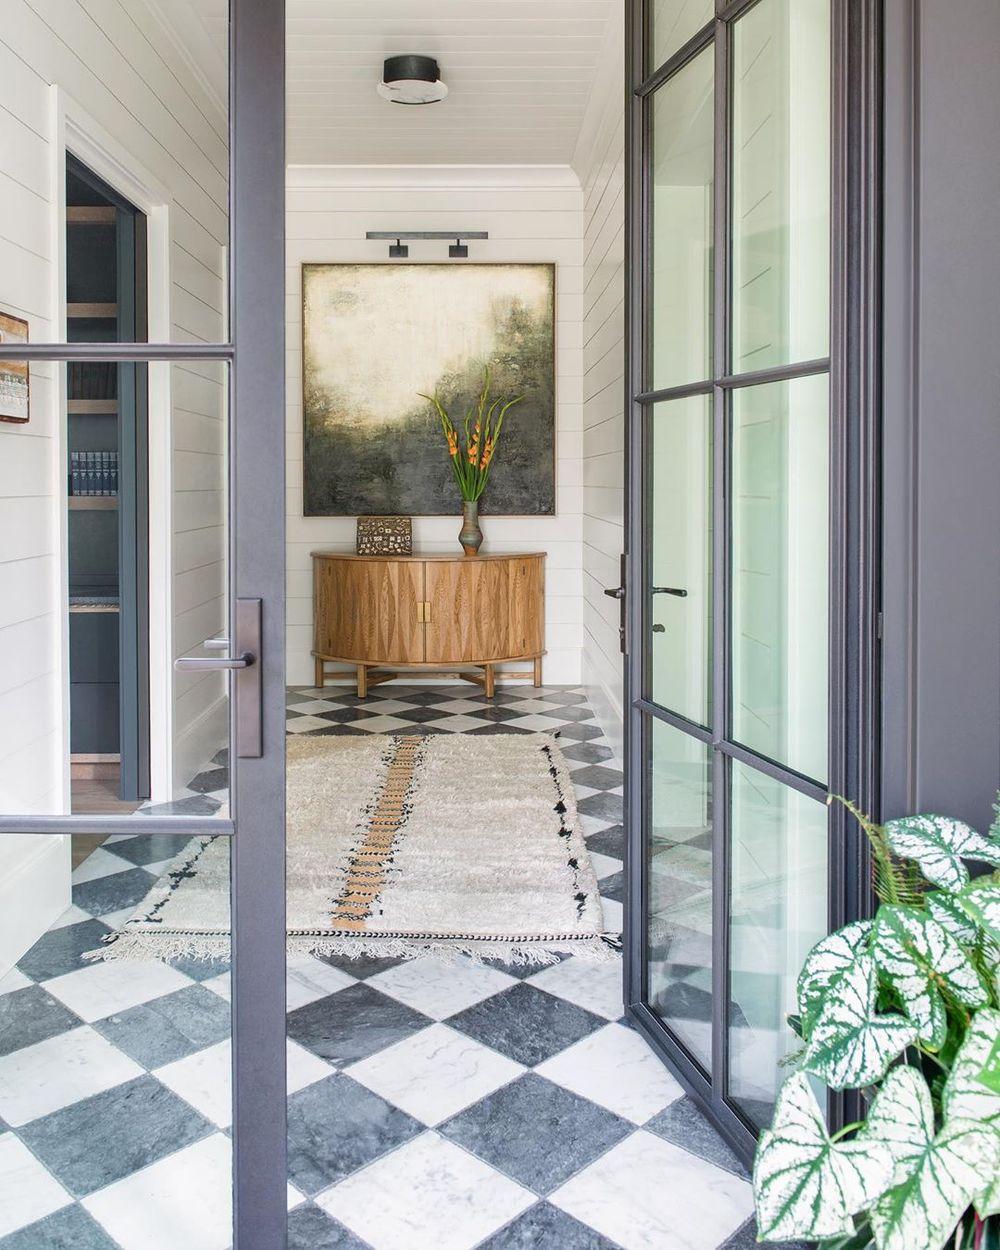 7 Black And White Checkered Floors Decor Ideas